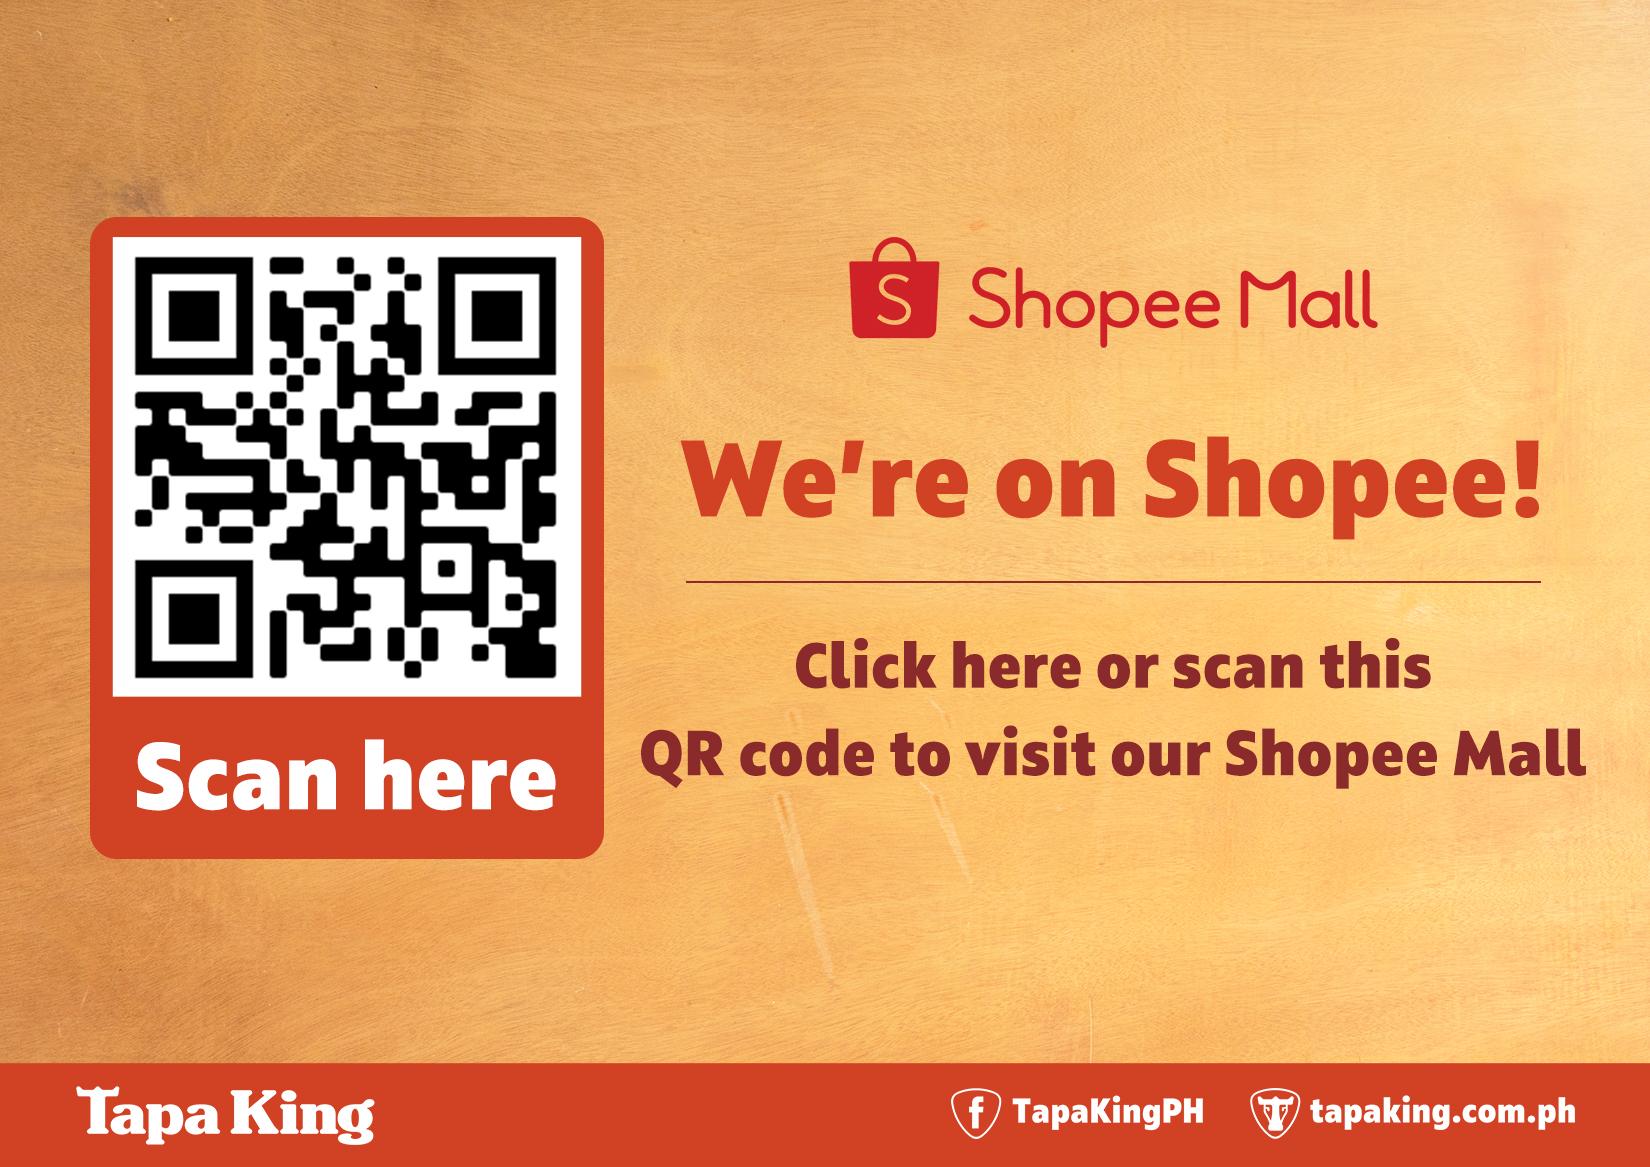 Tapa King on Shopee